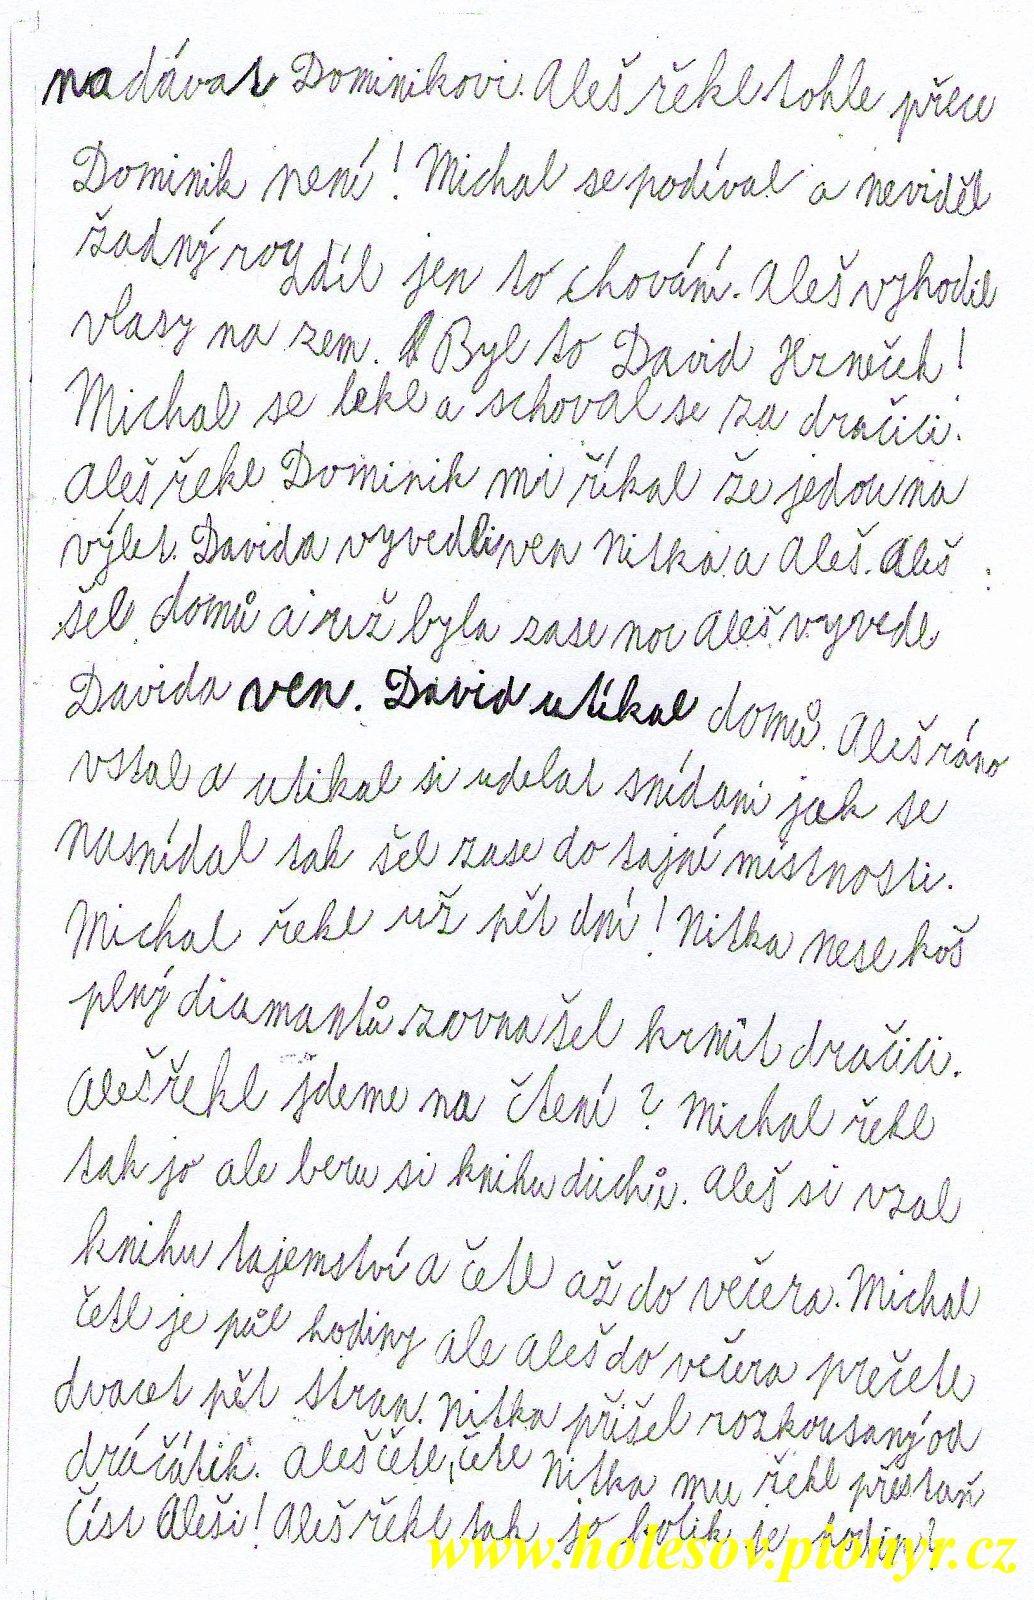 Hejduskova-Natalie-1-KATEGORIE-proza-1-misto_09